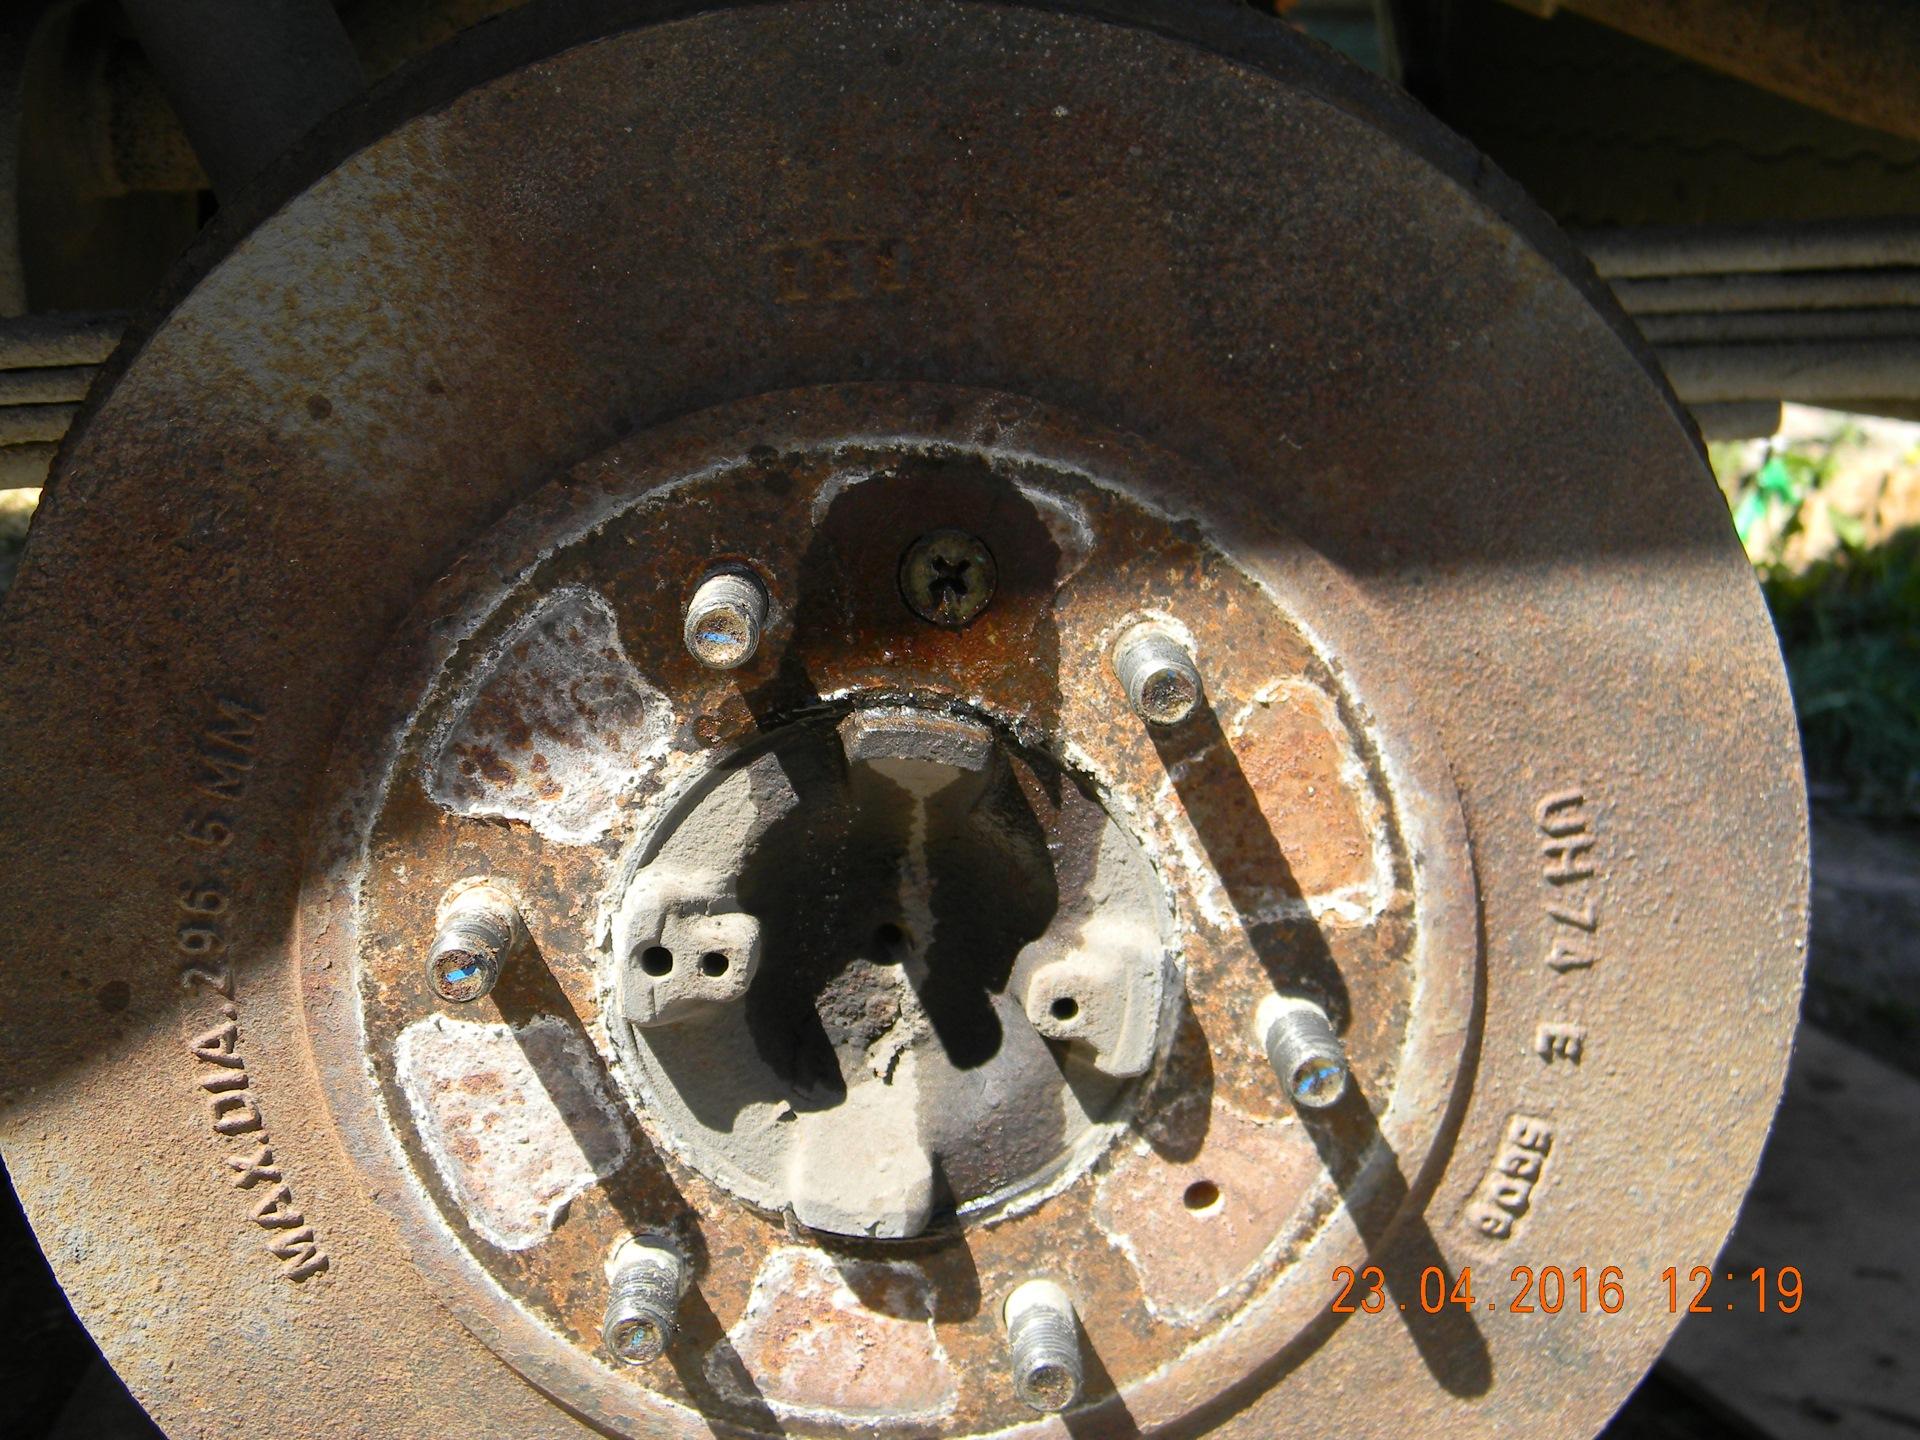 Замена штока ручного тормоза мазда Замена передней балки ниссан примера р12